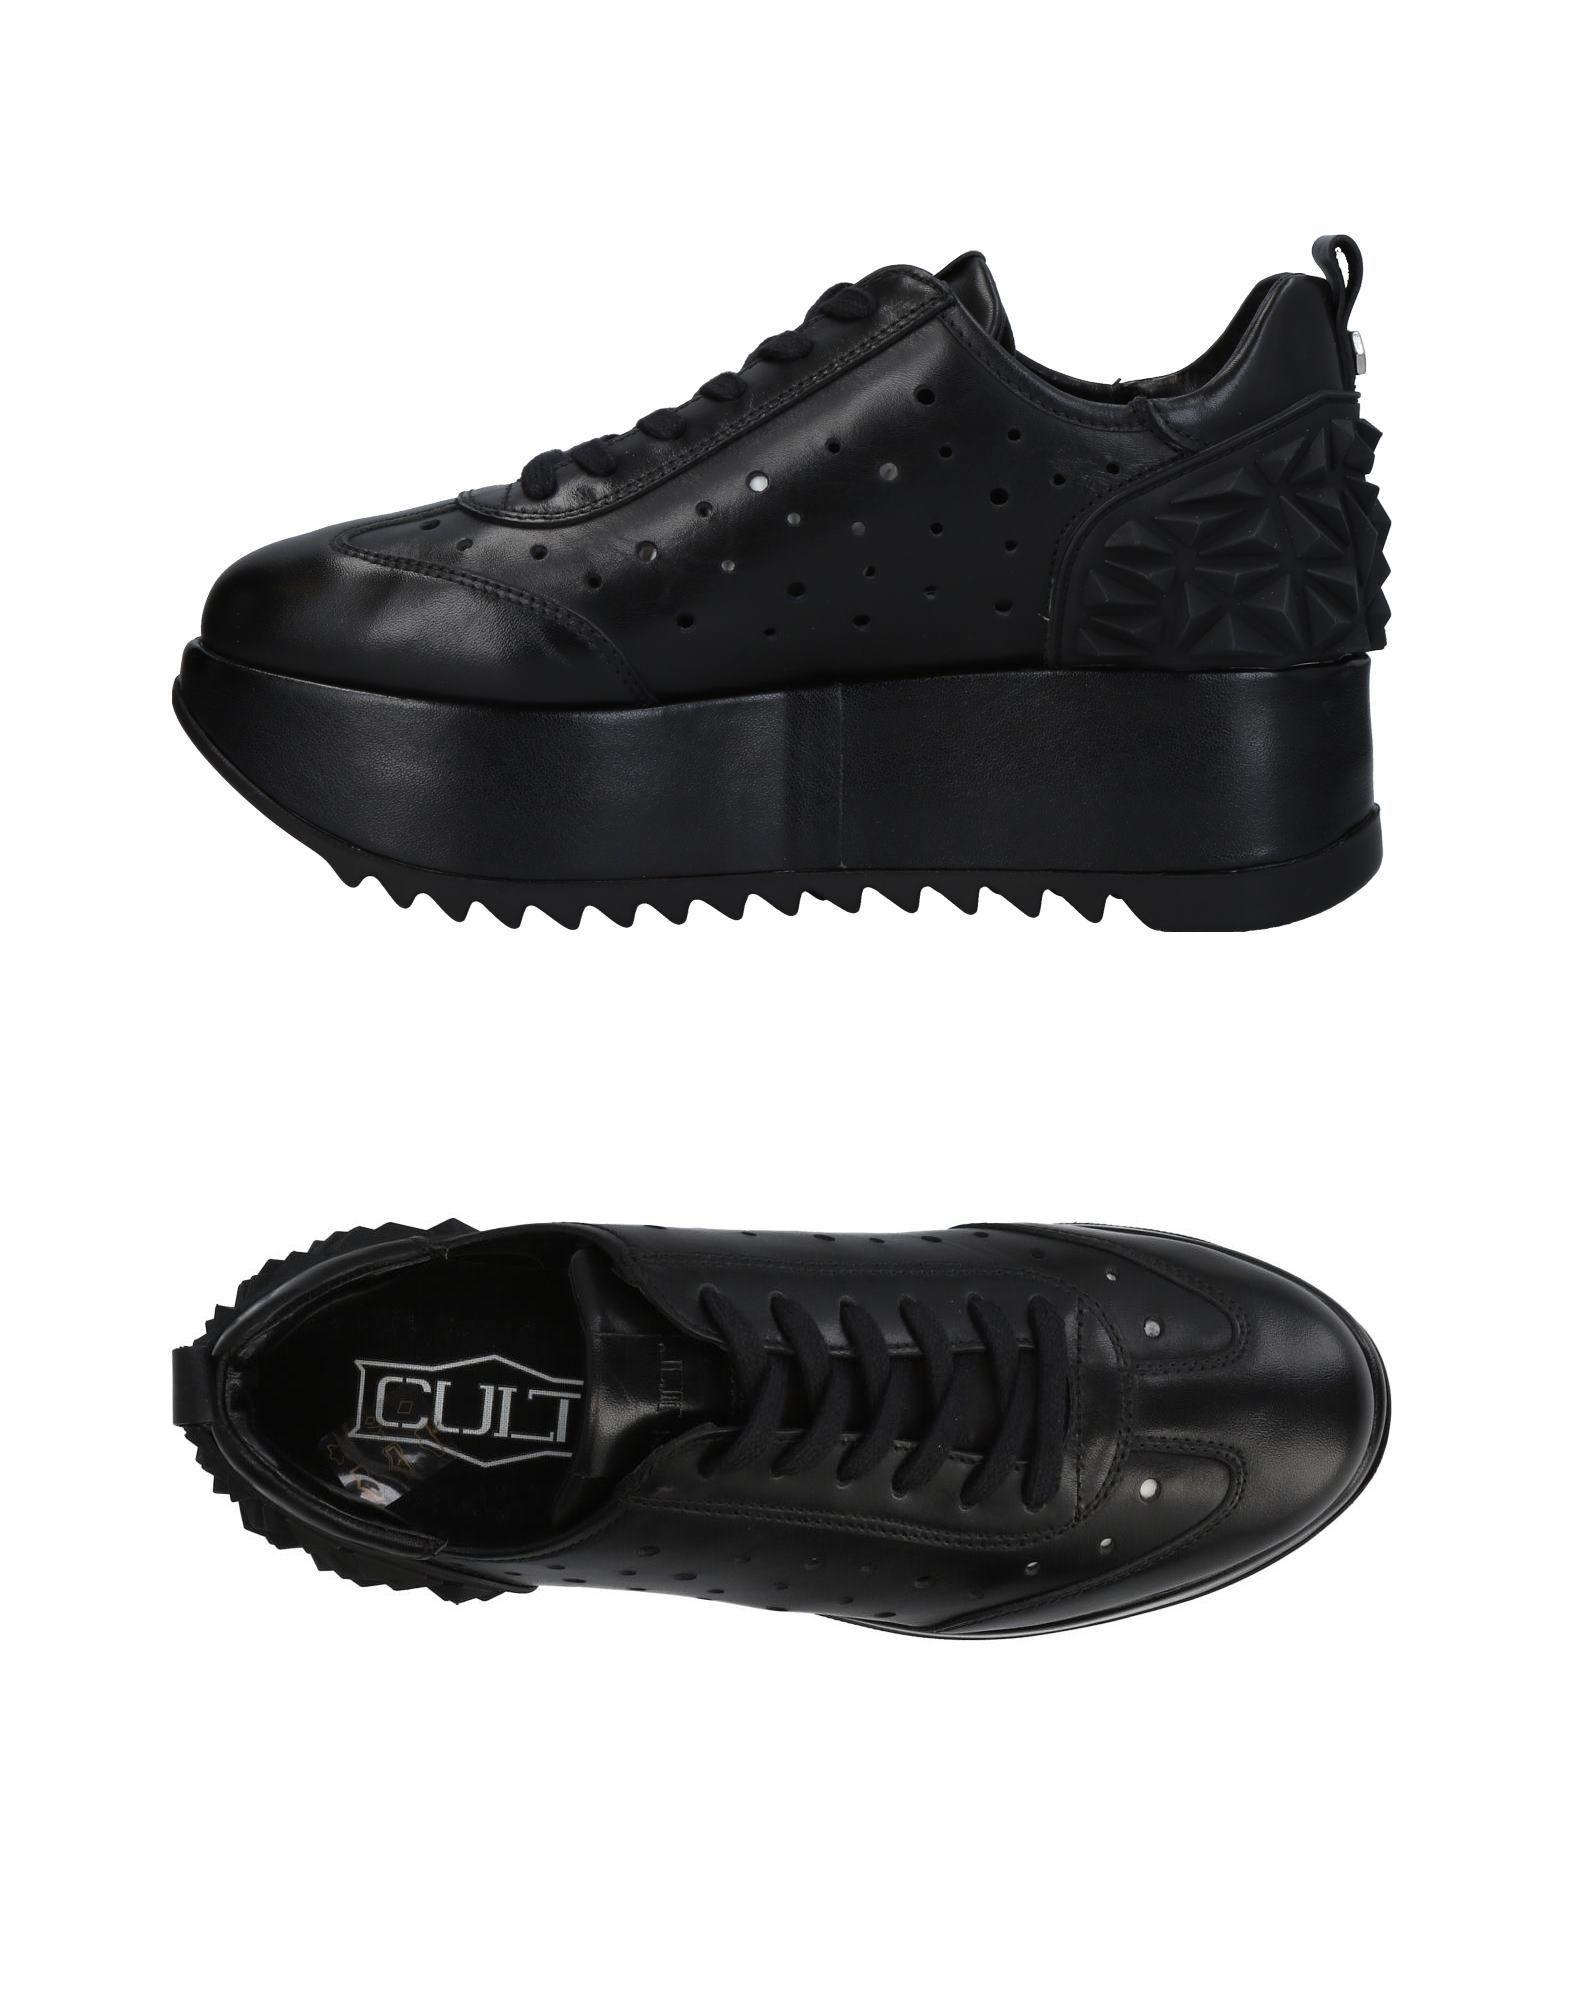 Sneakers Cult Donna - Acquista online su